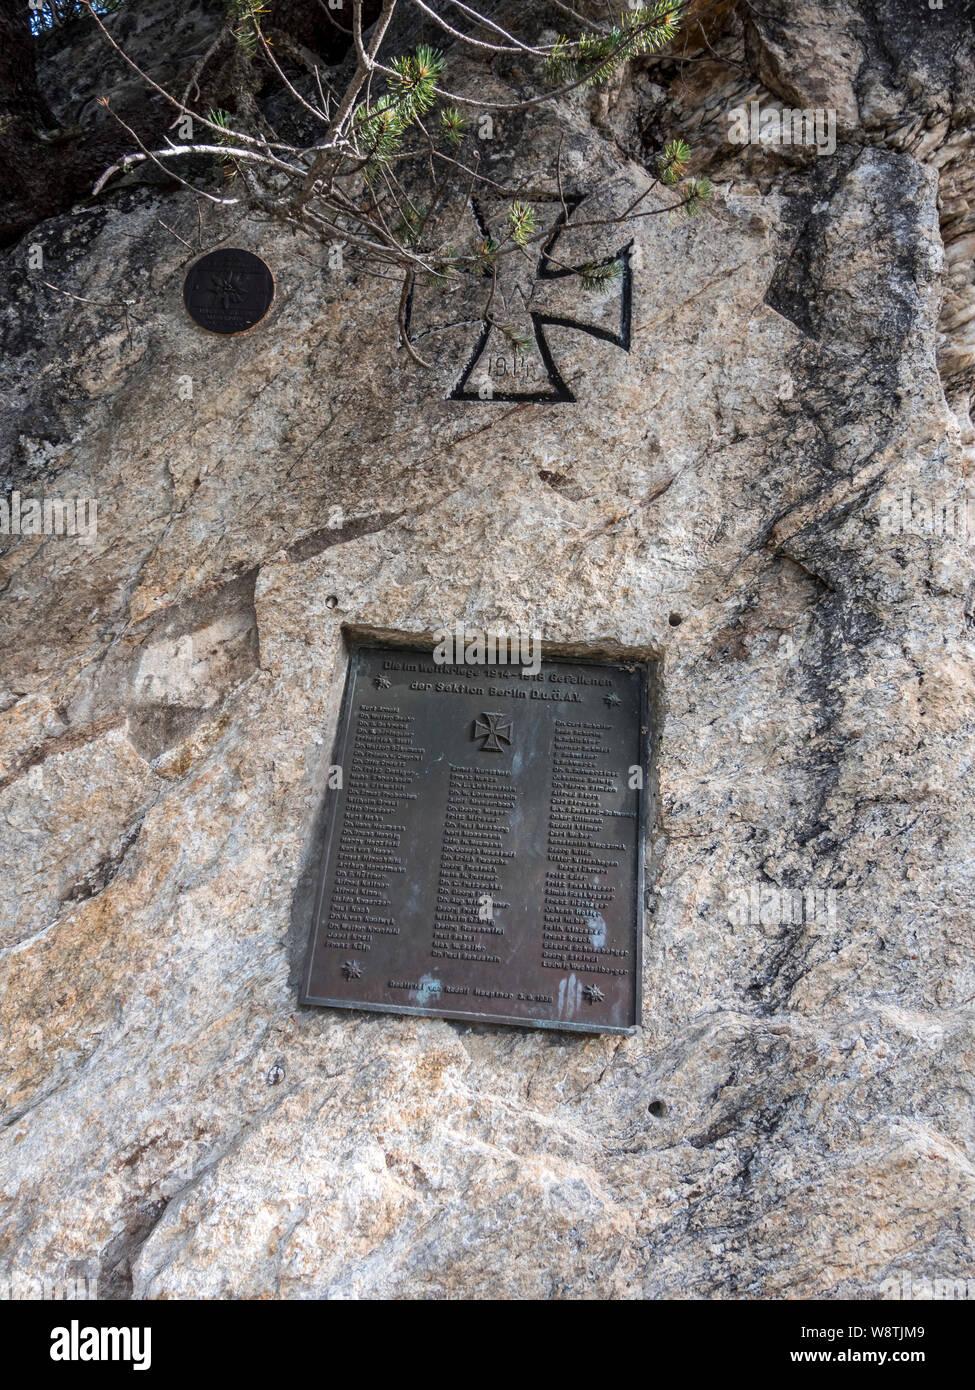 The DAV German Alpine Club war memorial near the Berliner Hut in the Zillertal Alps close to the resort town of Mayrhofen in the Austrian Tirol Stock Photo